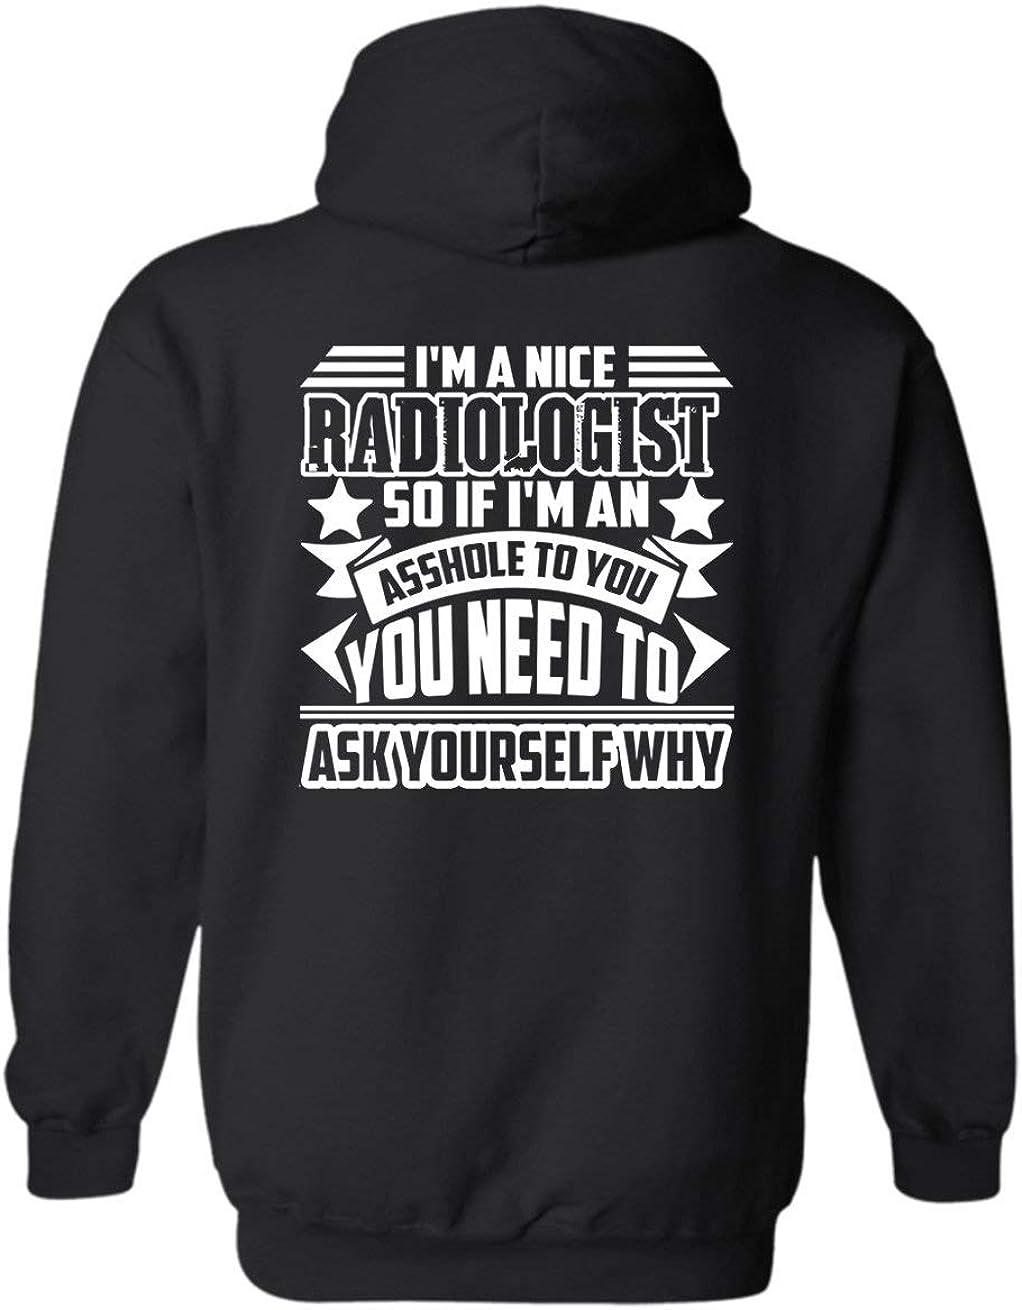 Amazon Com I M A Nice Radiologist Long Hoodies Hooded Sweatshirt Gift Clothing